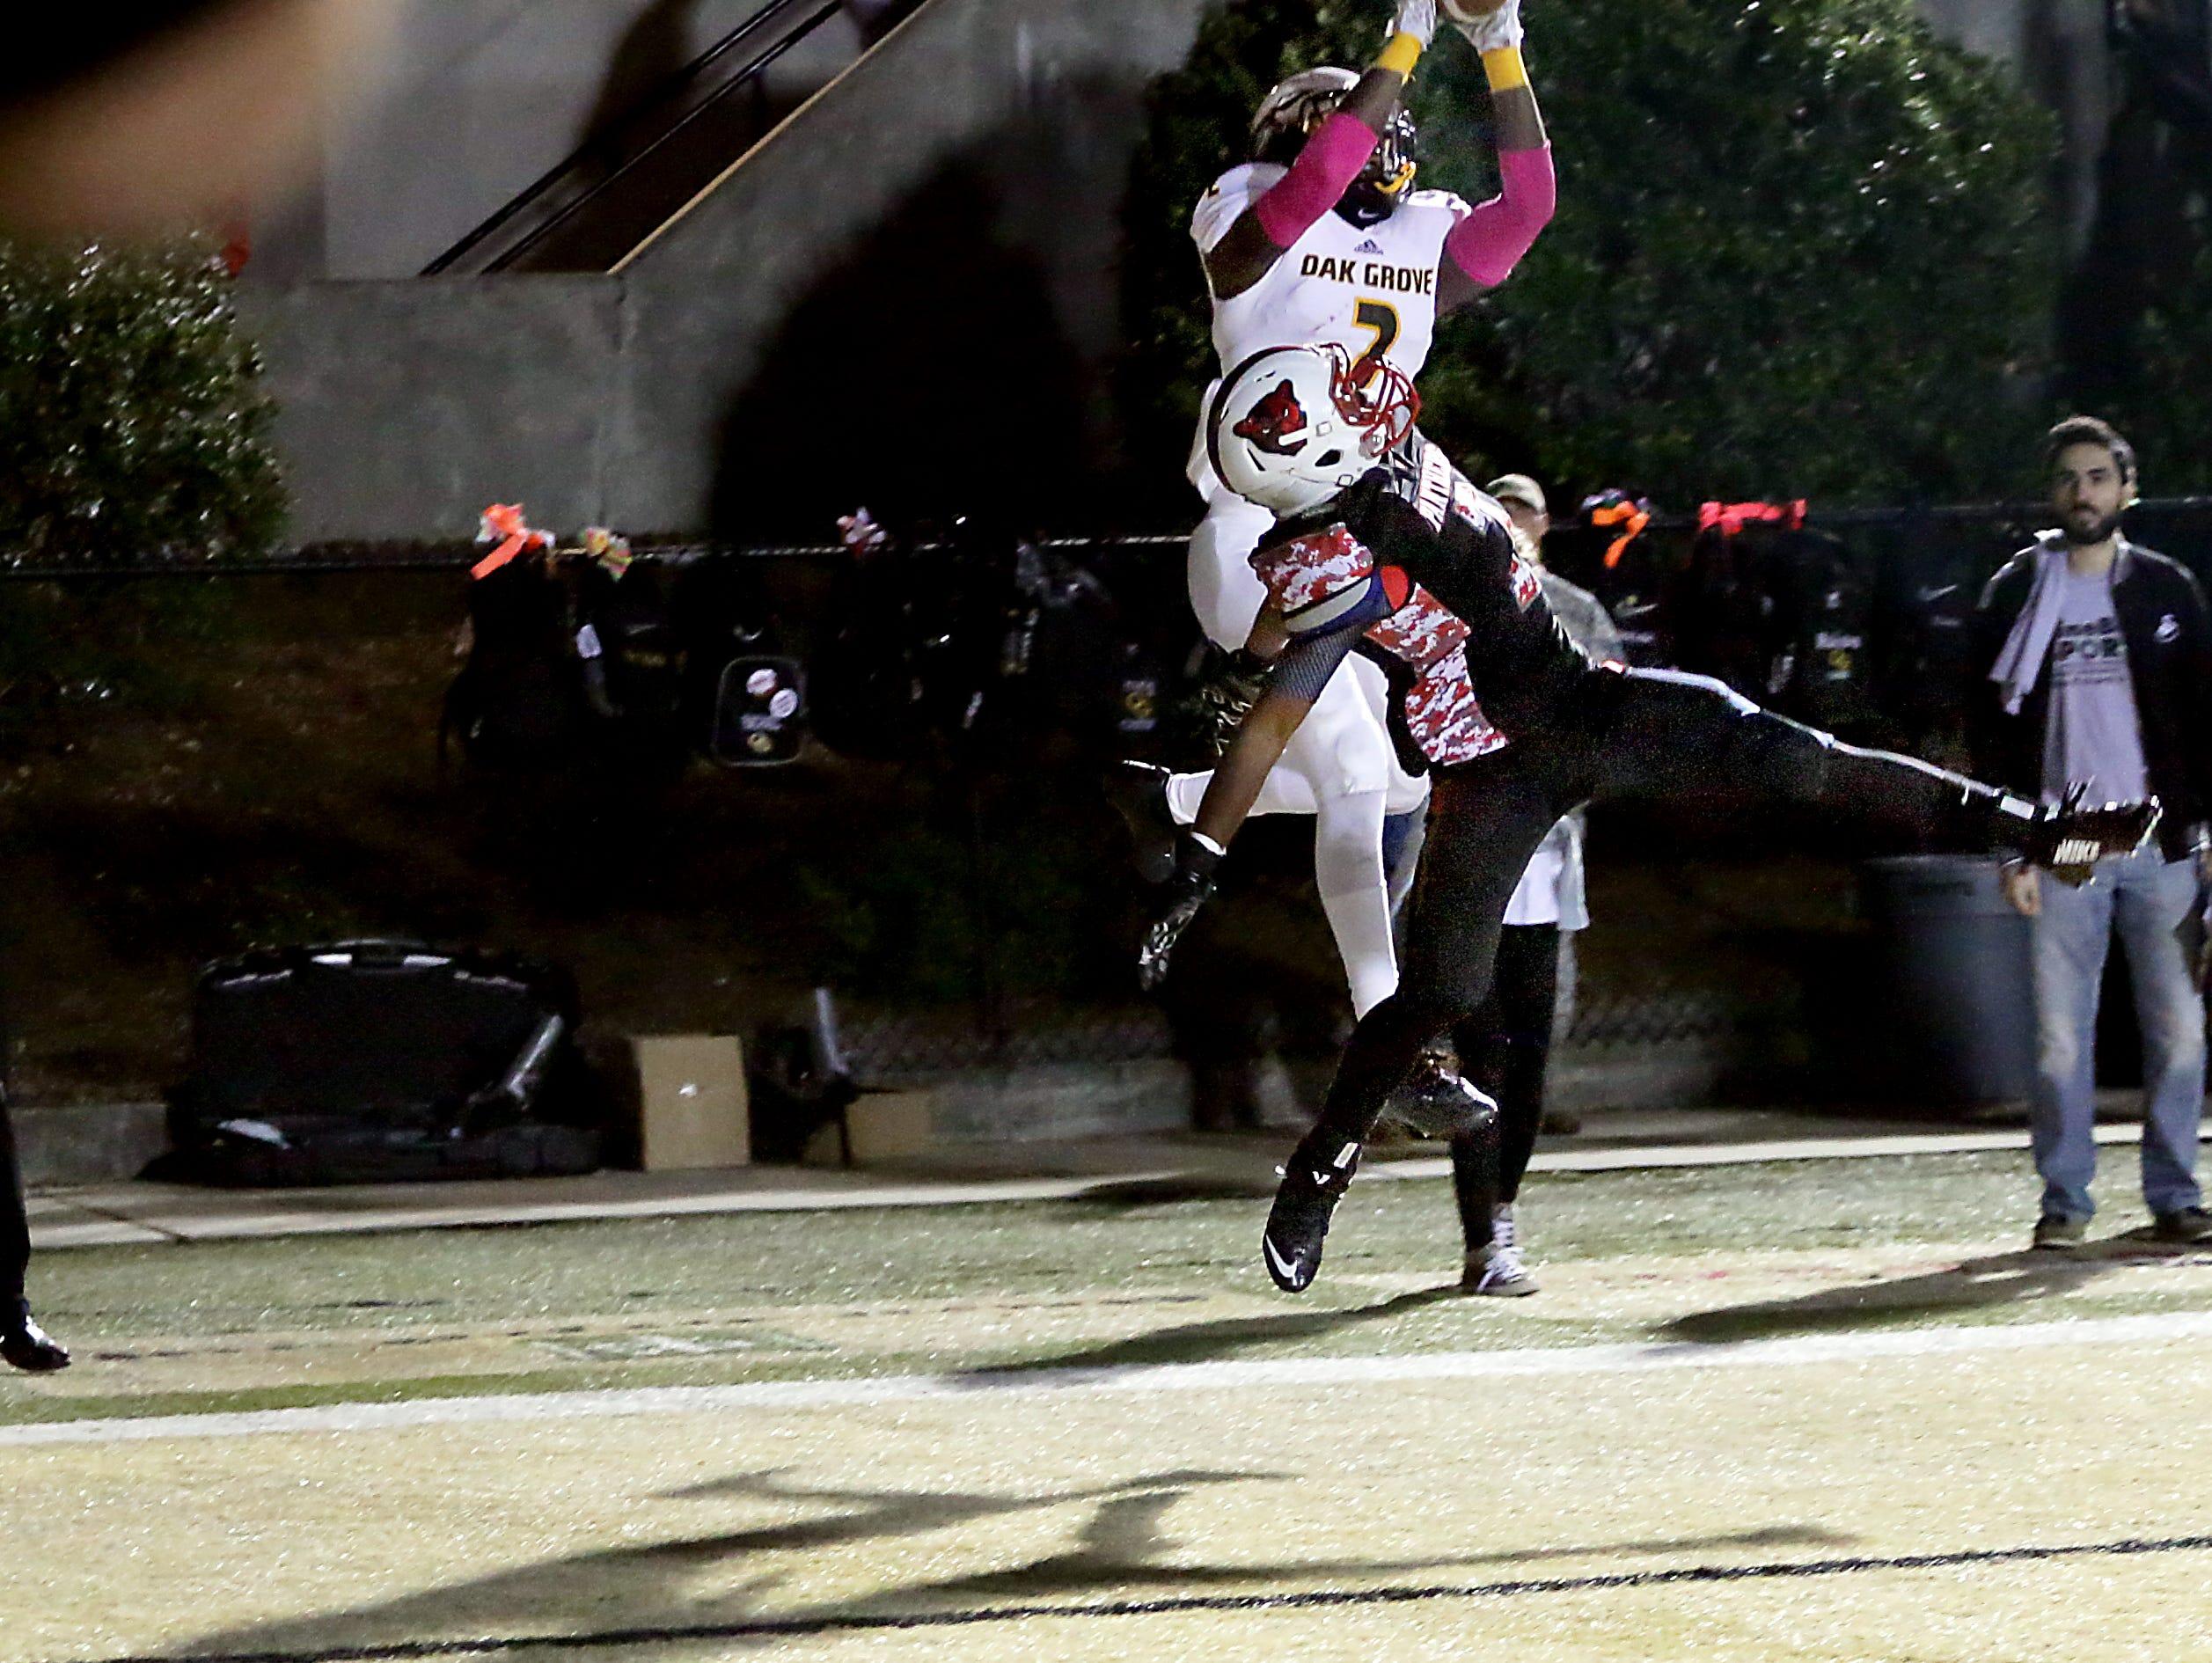 Oak Grove player Jordan Ducan (2) catches the ball for an Oak Grove touchdown during a game against Petal High School at Oak Grove High School Friday.